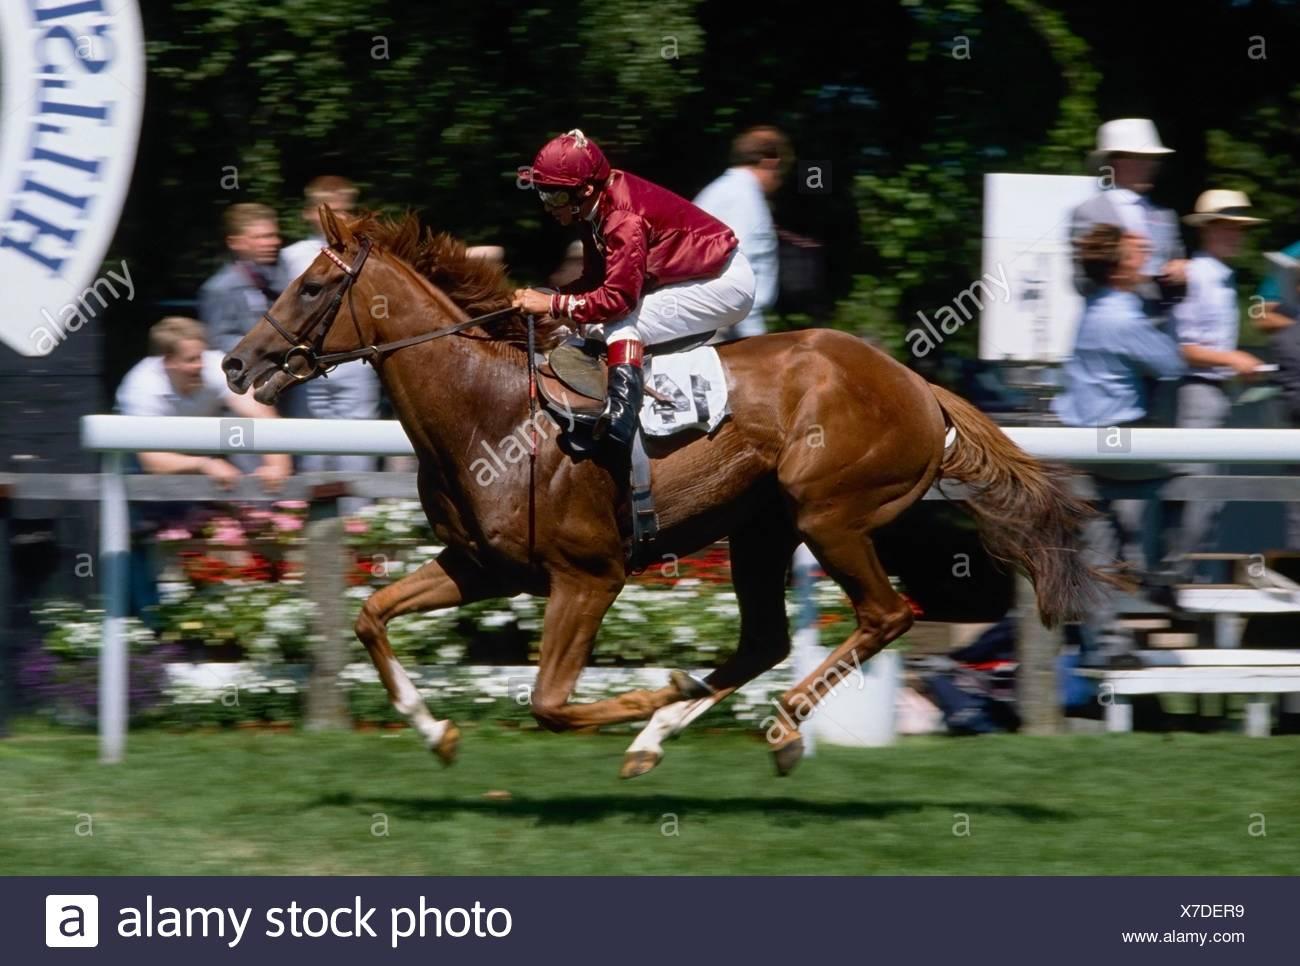 El Hipódromo de Newmarket, Suffolk, Inglaterra; Carreras de Caballos Imagen De Stock